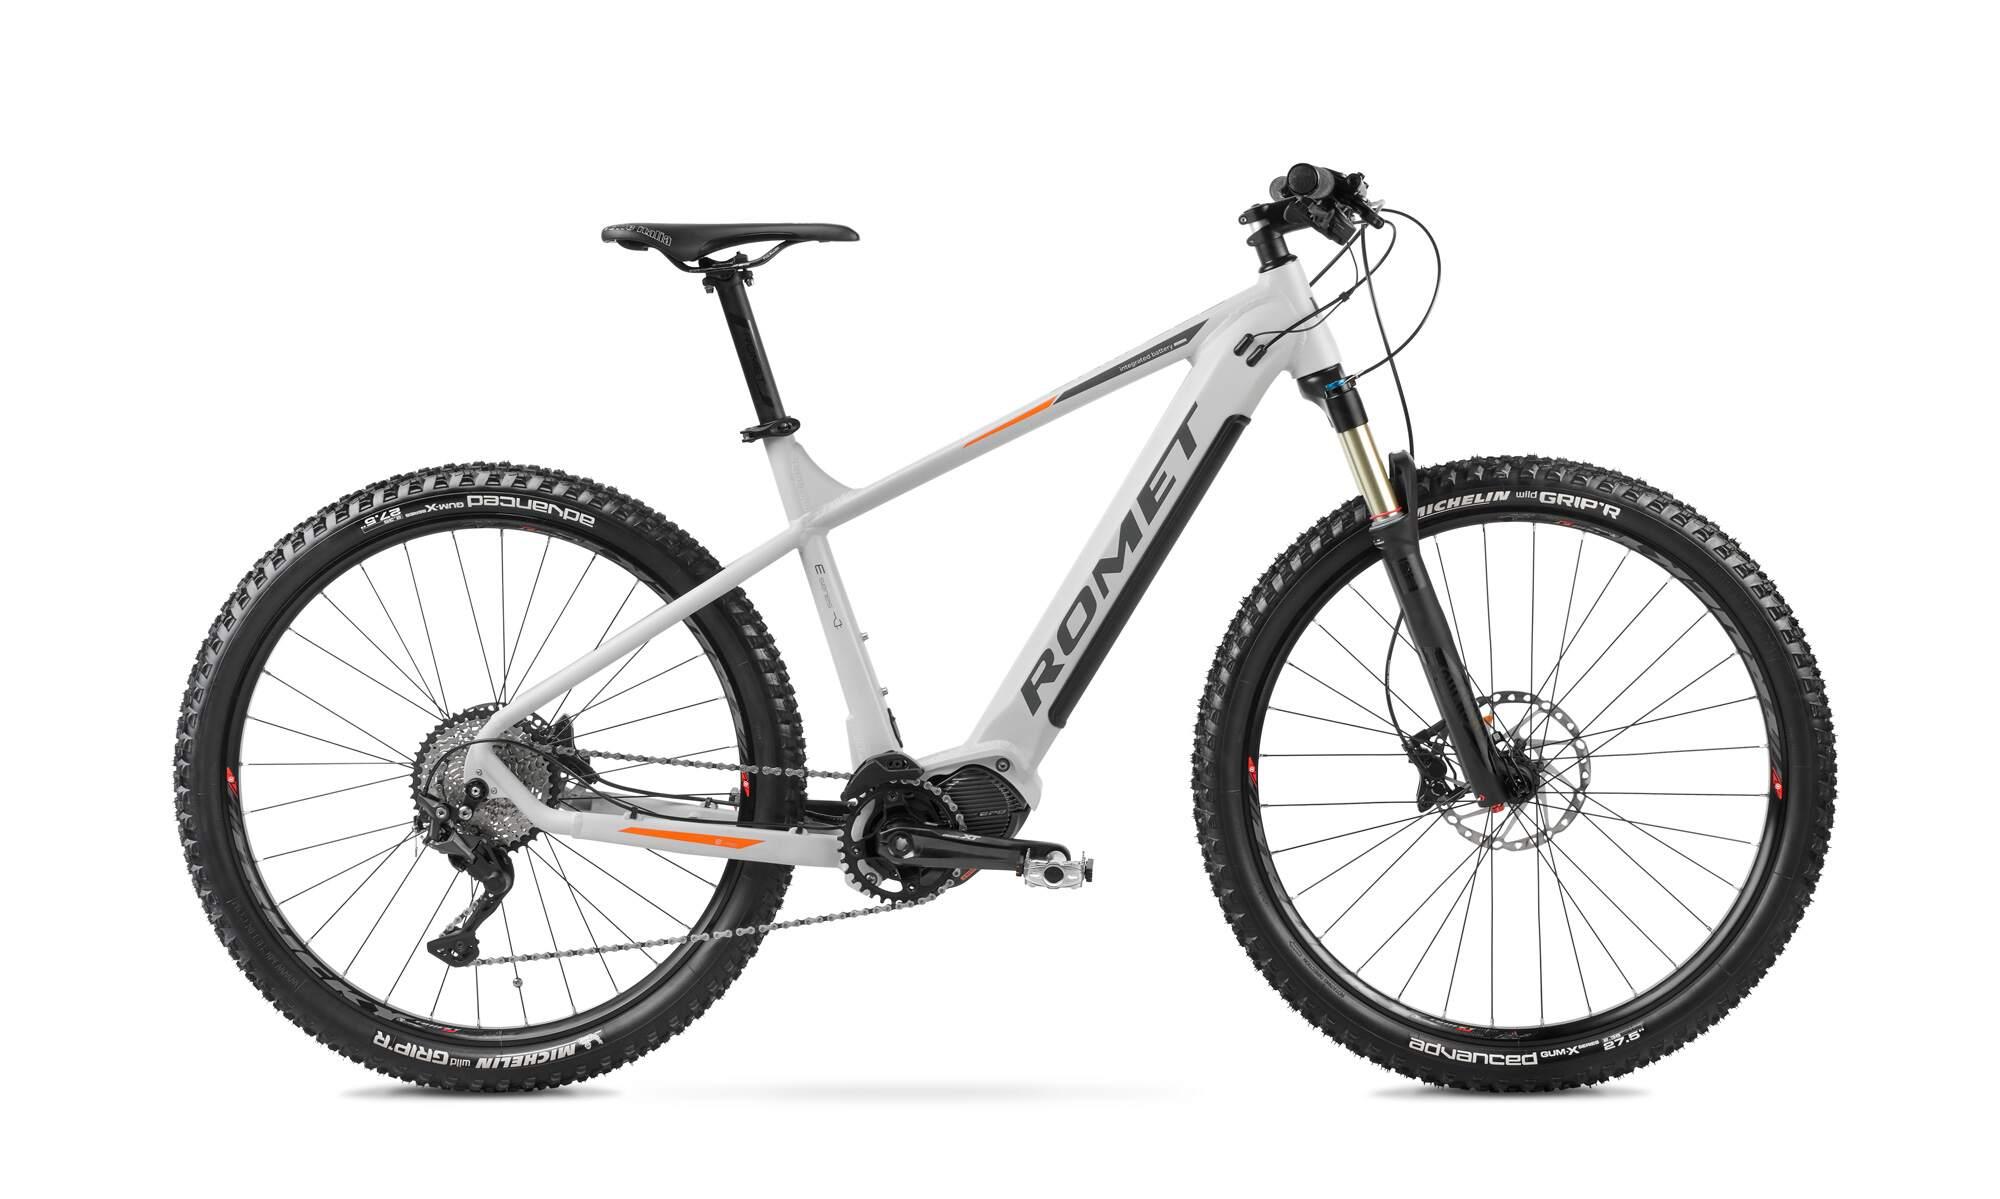 Electric Mountain Bike Mid Drive 27.5 Inch Romet ERM205 19Inch White